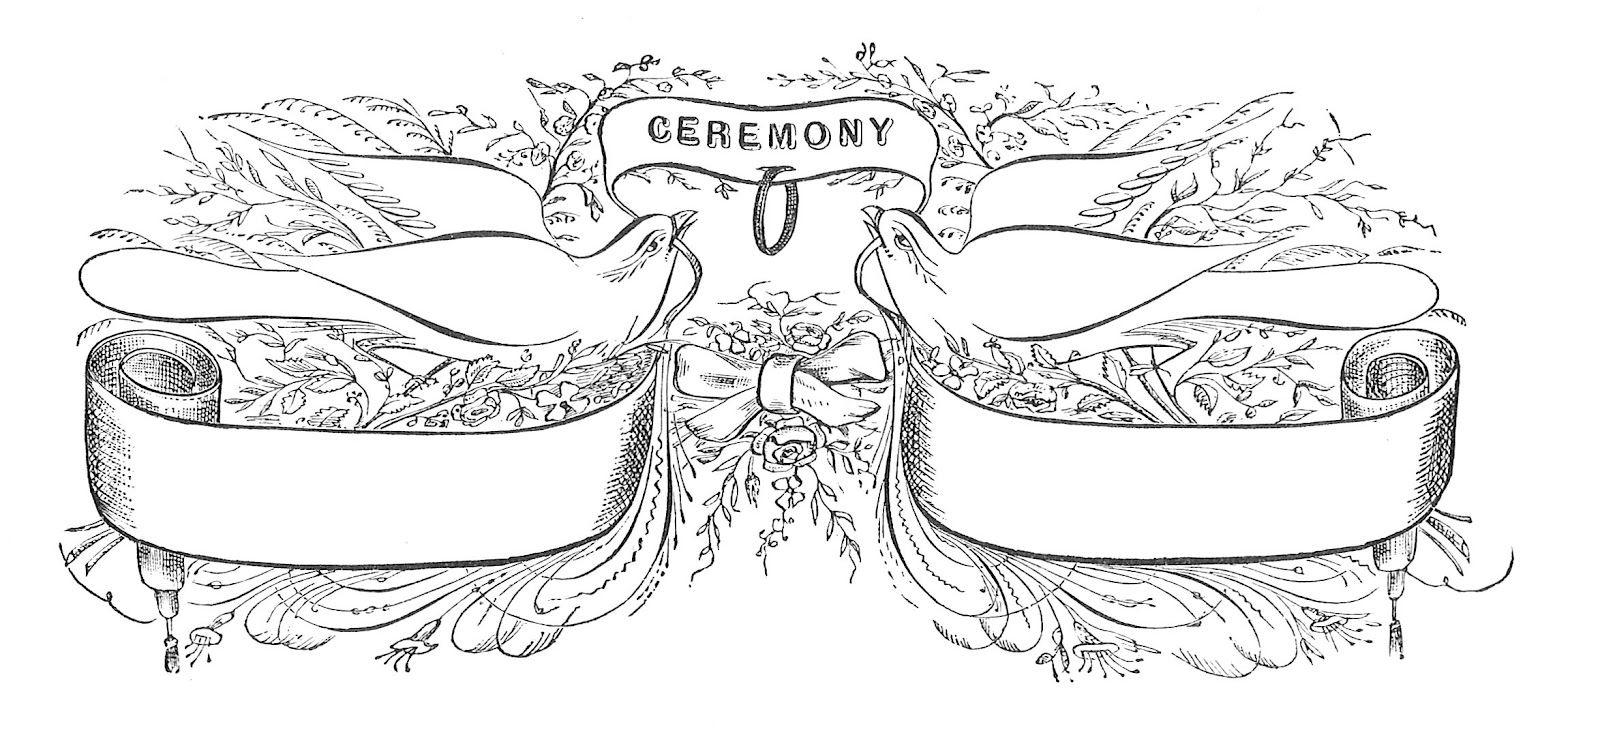 Antique Images: Vintage Wedding Graphic: Victorian Graphic Design ...